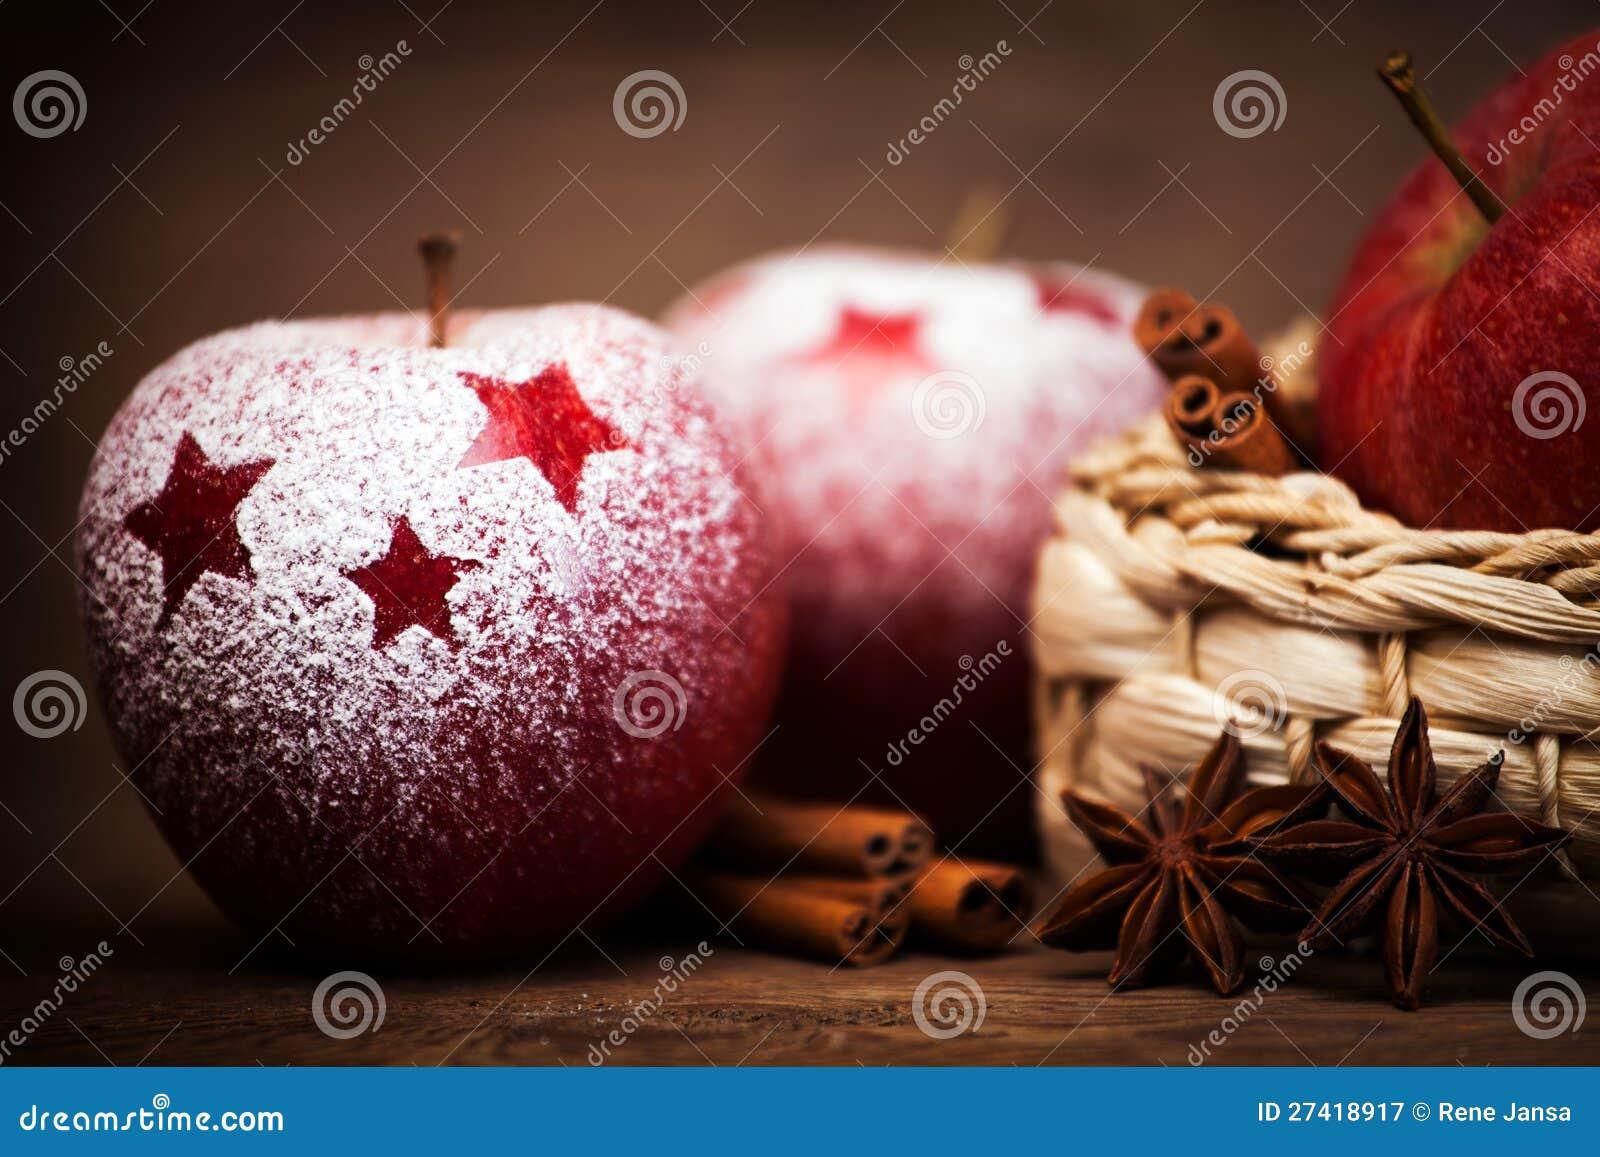 Christmas still life royalty free stock photography